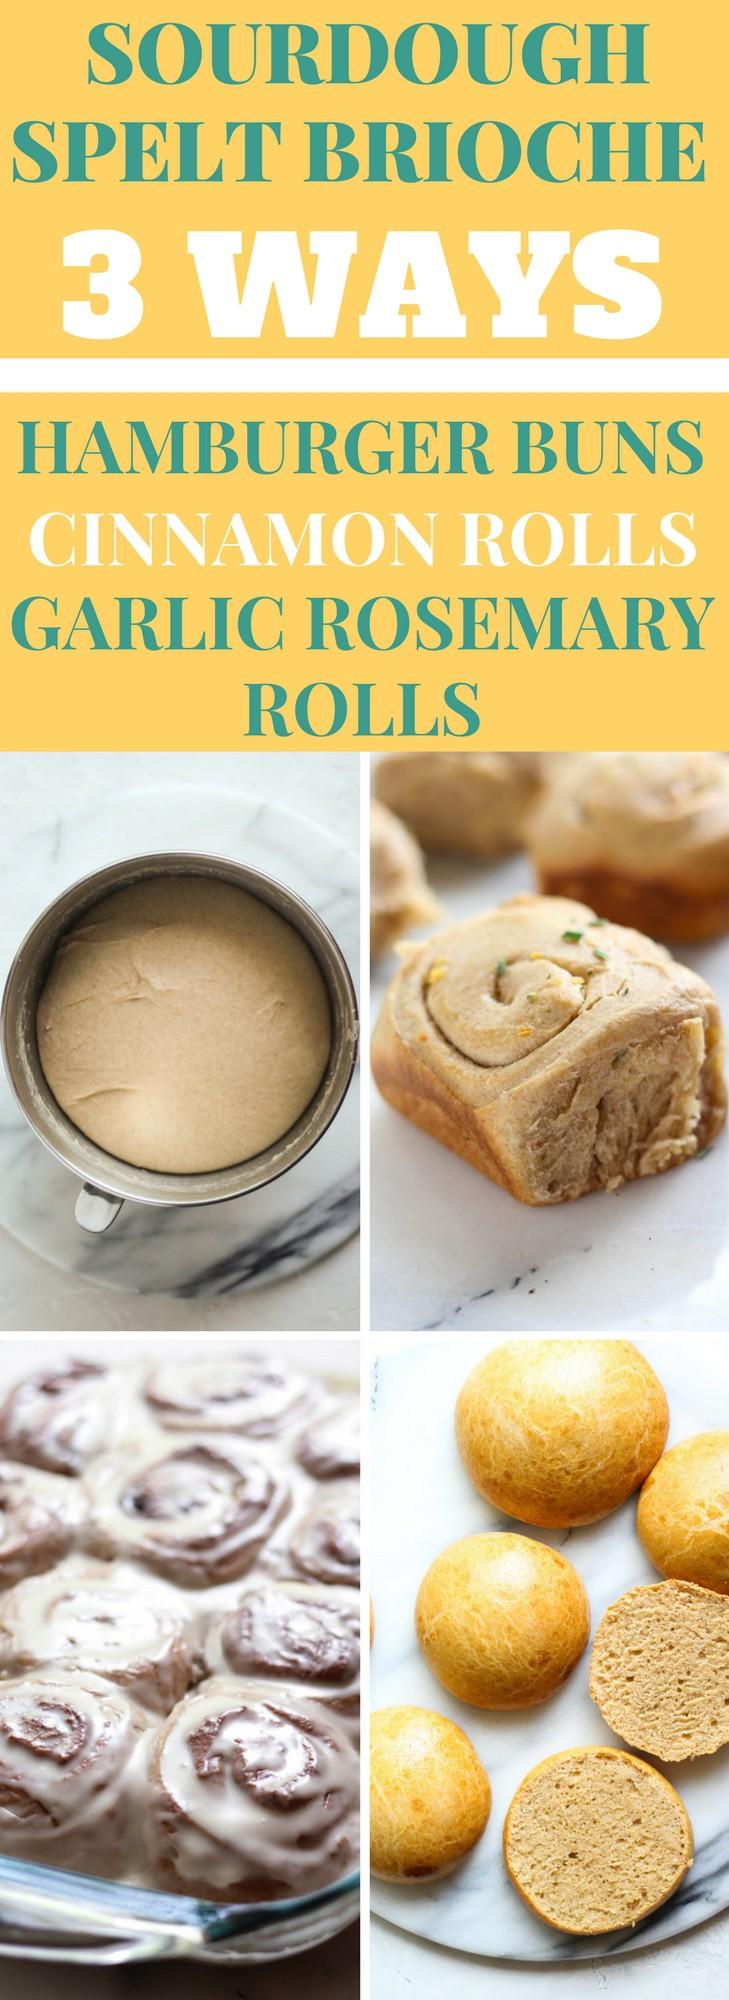 Learn 3 ways to make sourdough spelt brioche dough. Transform them into sourdough cinnamon rolls, garlic rosemary rolls, and hamburger brioche buns